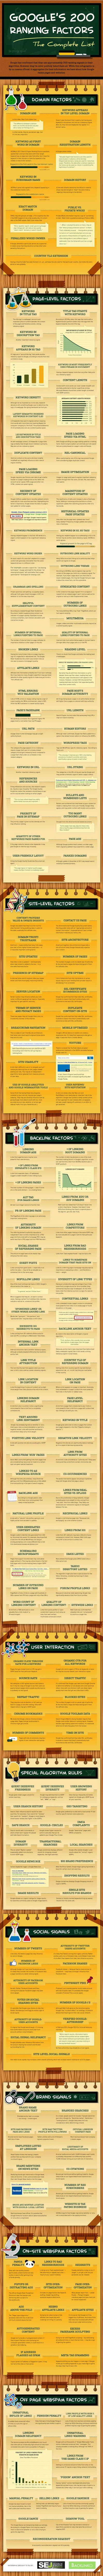 200 factores de ranking